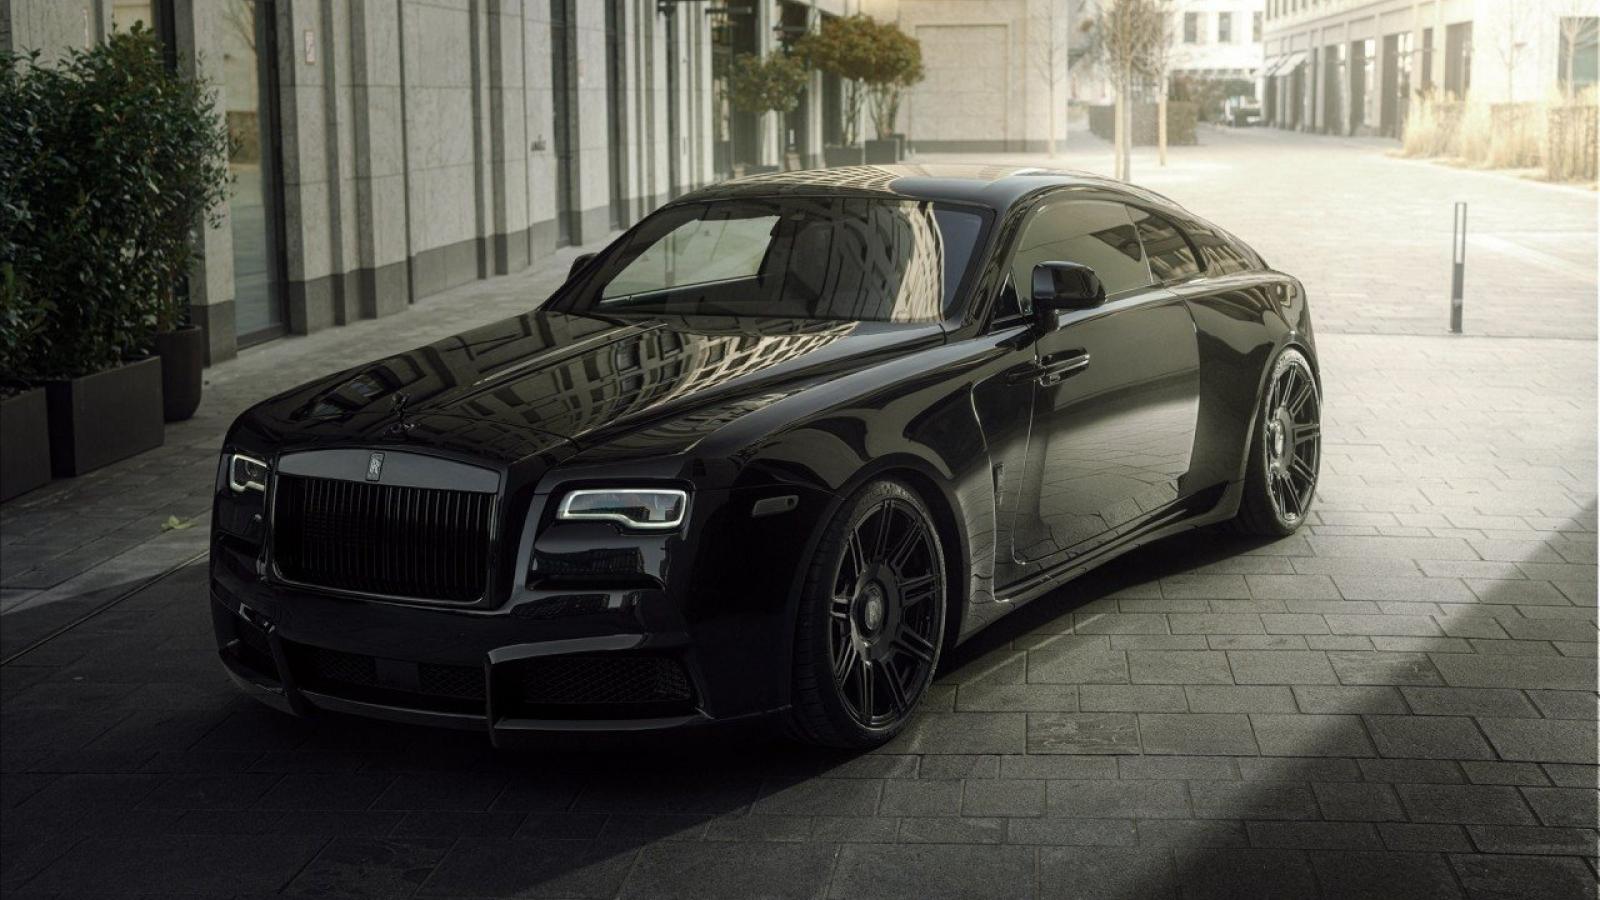 Ngắm Rolls-Royce Wraith Black Badge với gói nâng cấp Spofec Overdose